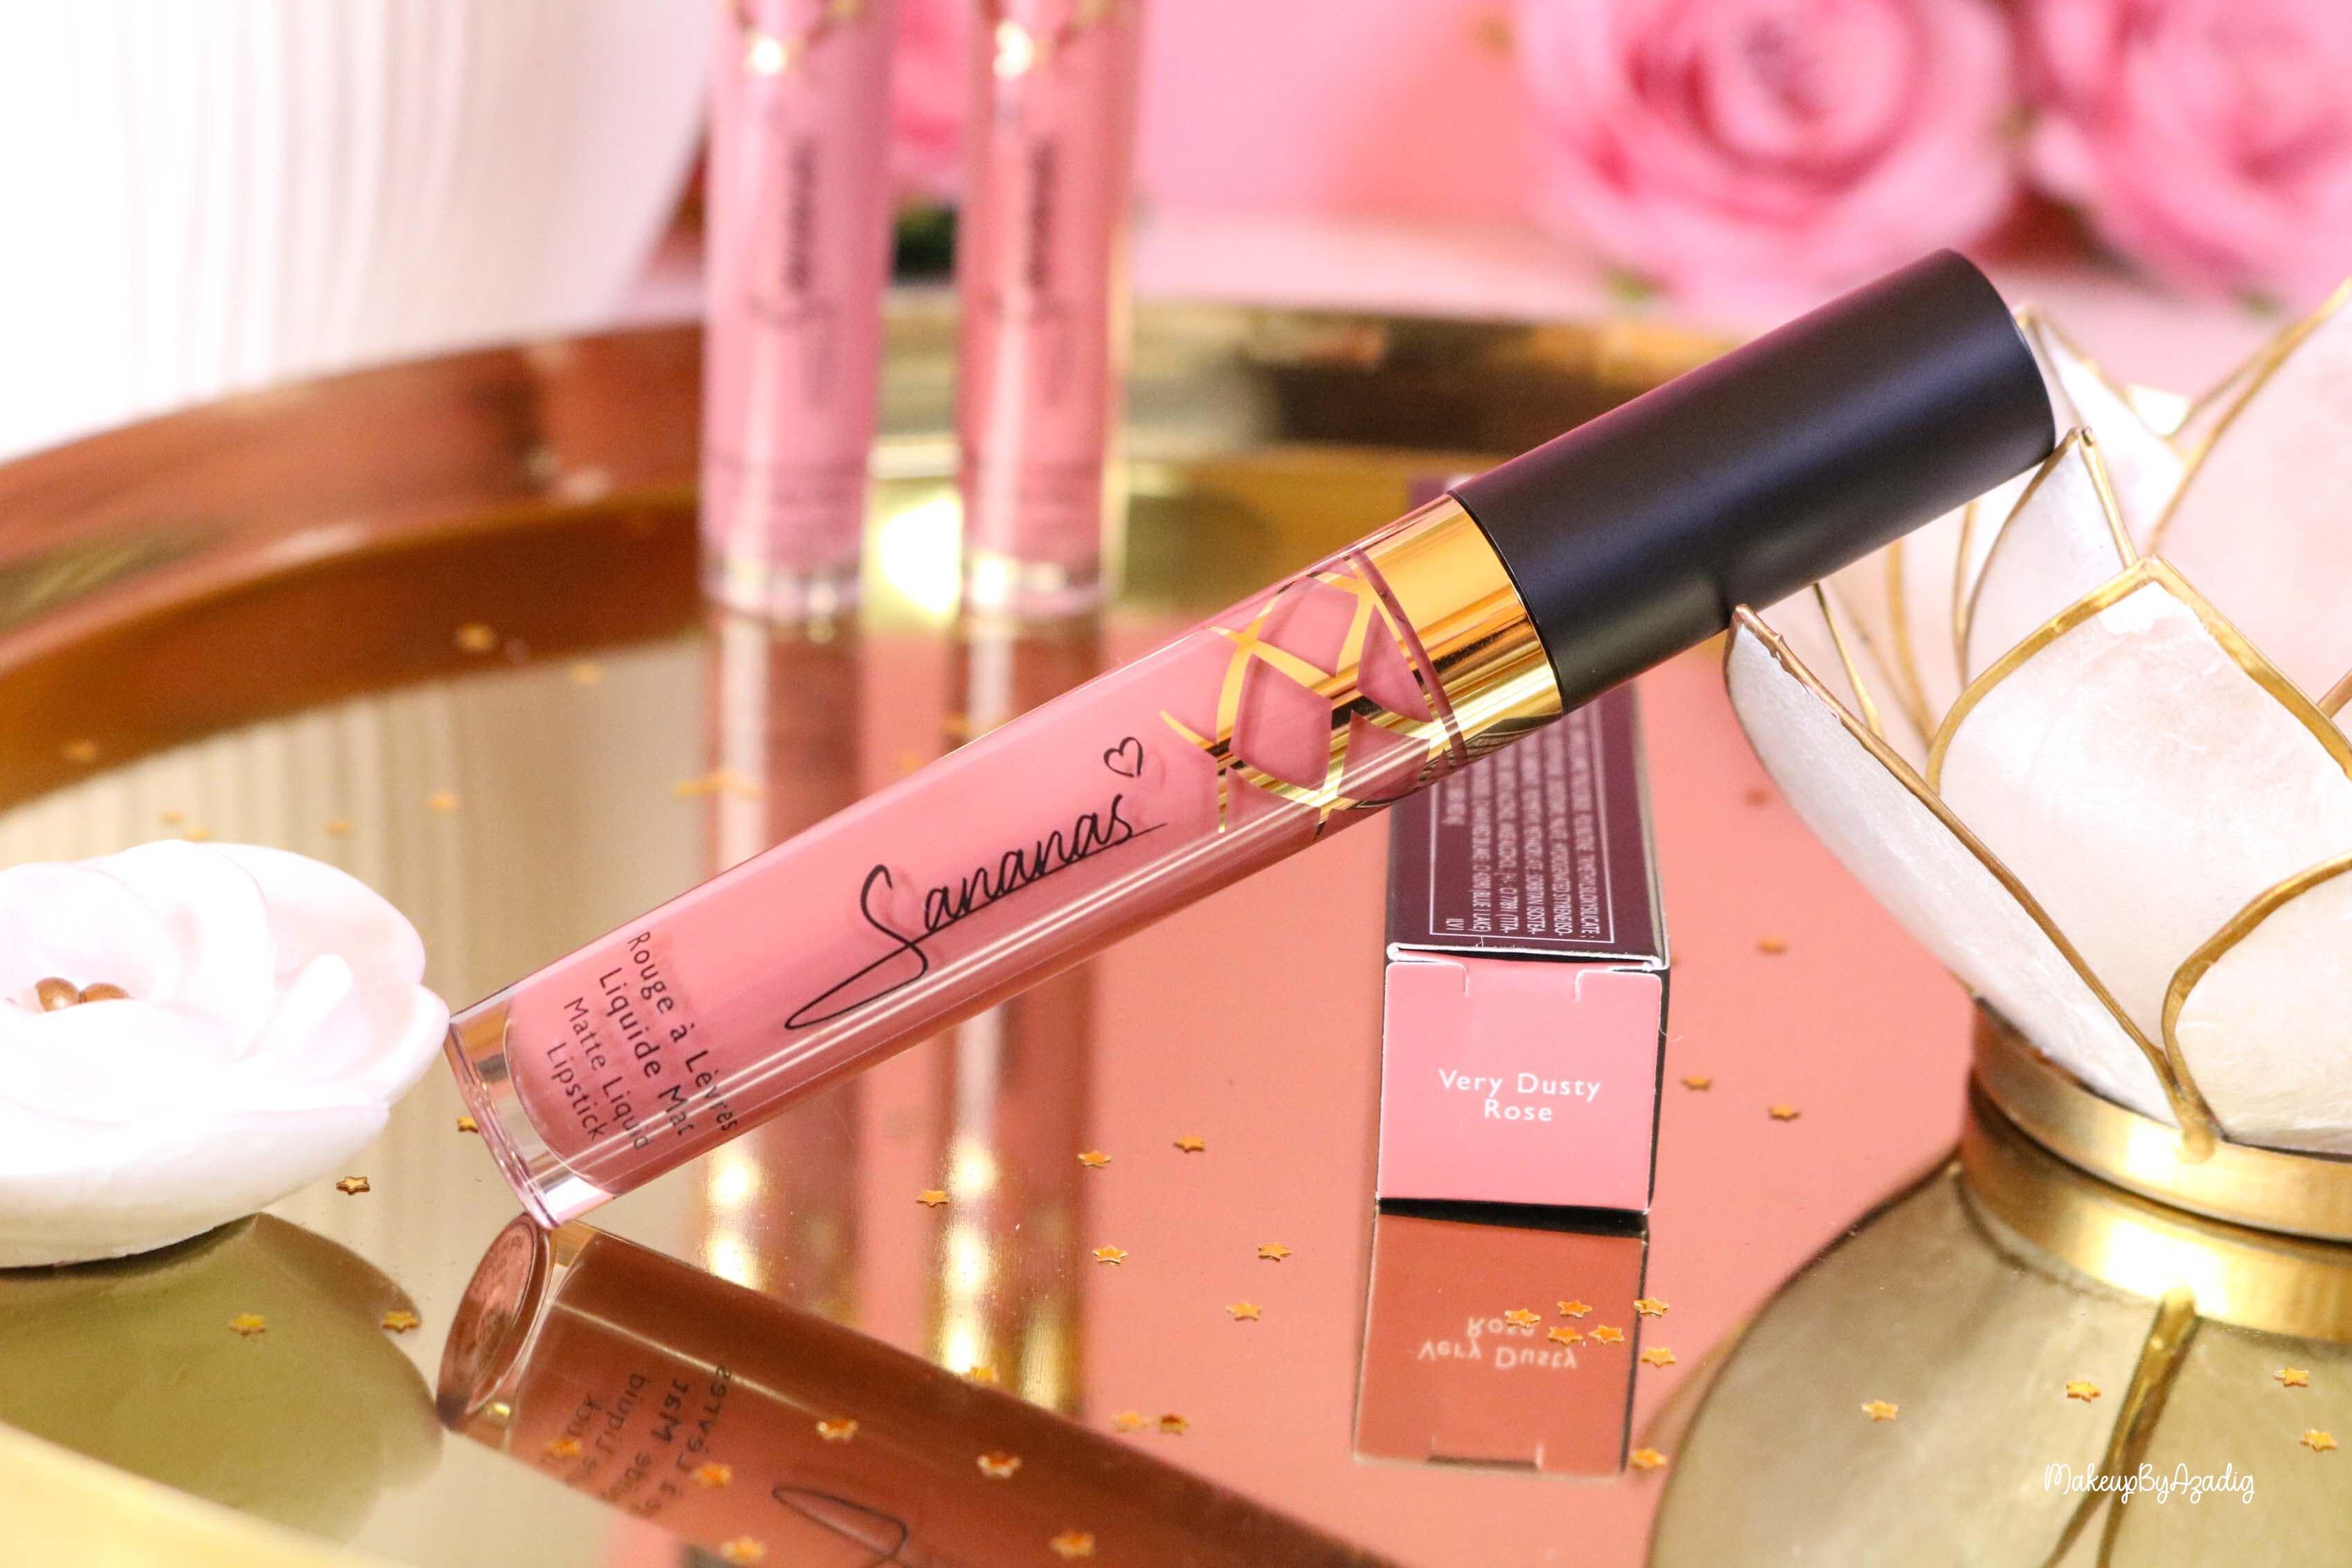 revue-marque-sananas-beauty-rouge-a-levres-vernis-kit-avis-prix-amazon-makeupbyazadig-dusty-pink-greige-rosier-rose